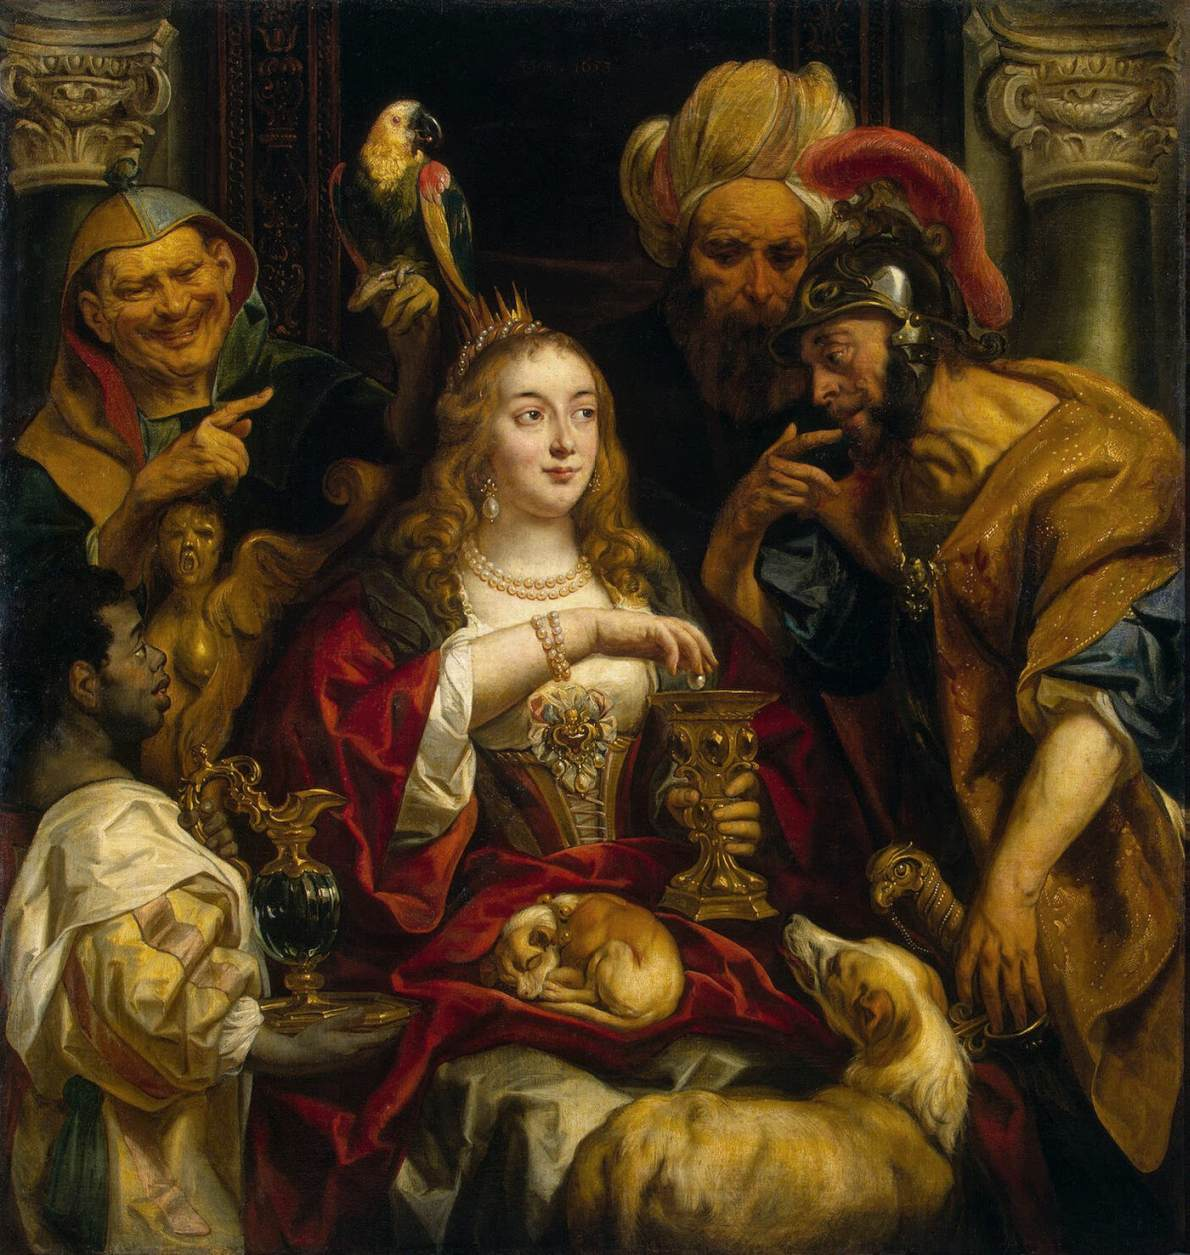 Jacob Jordaens, Cleopatra's Feast. Painted c. 1653.